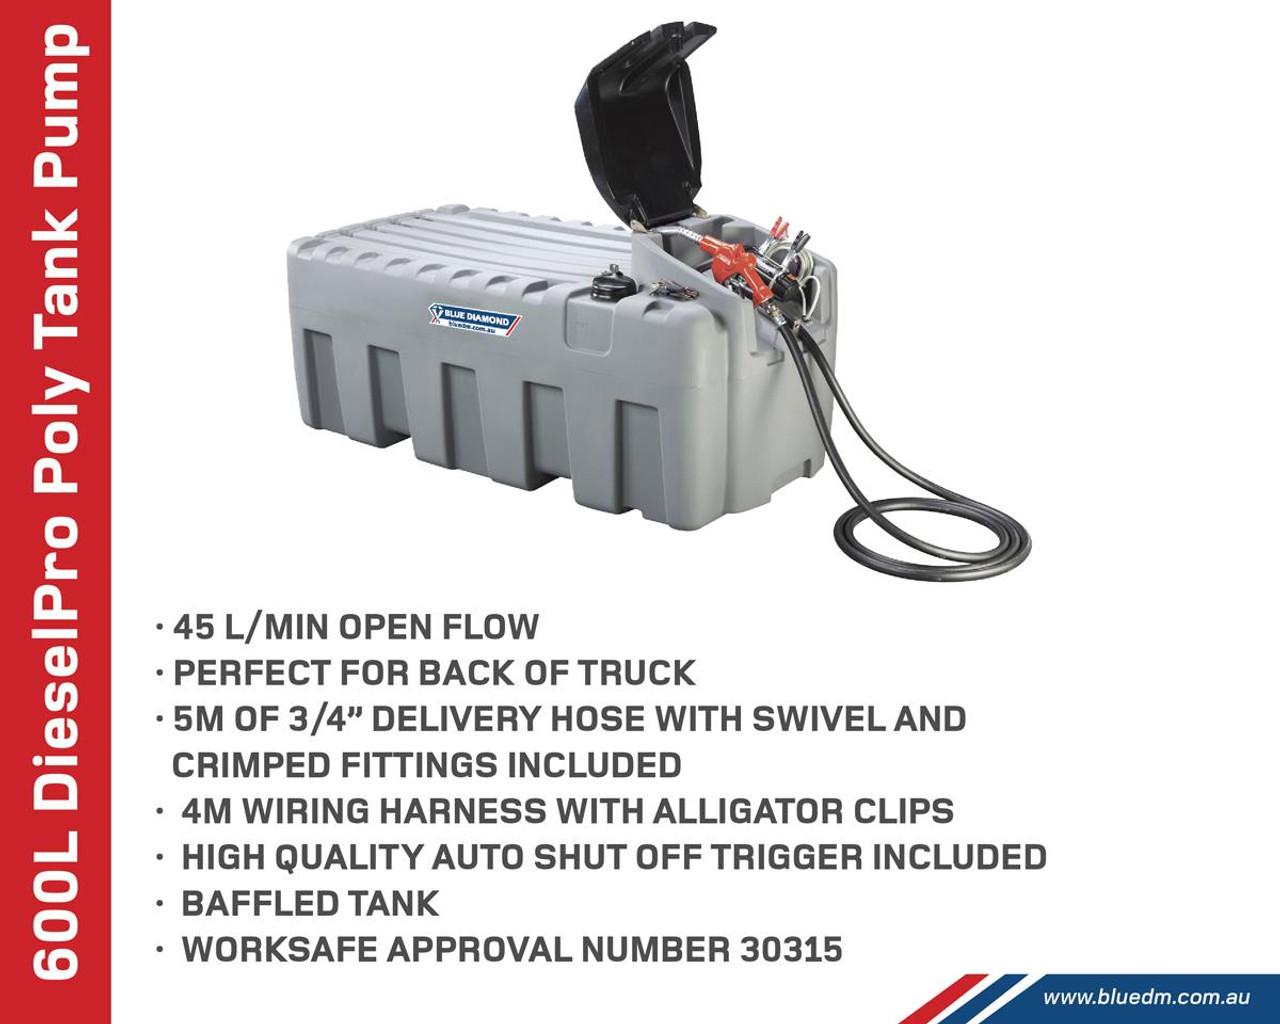 600L Diesel Fuel Tank for UTE or Truck